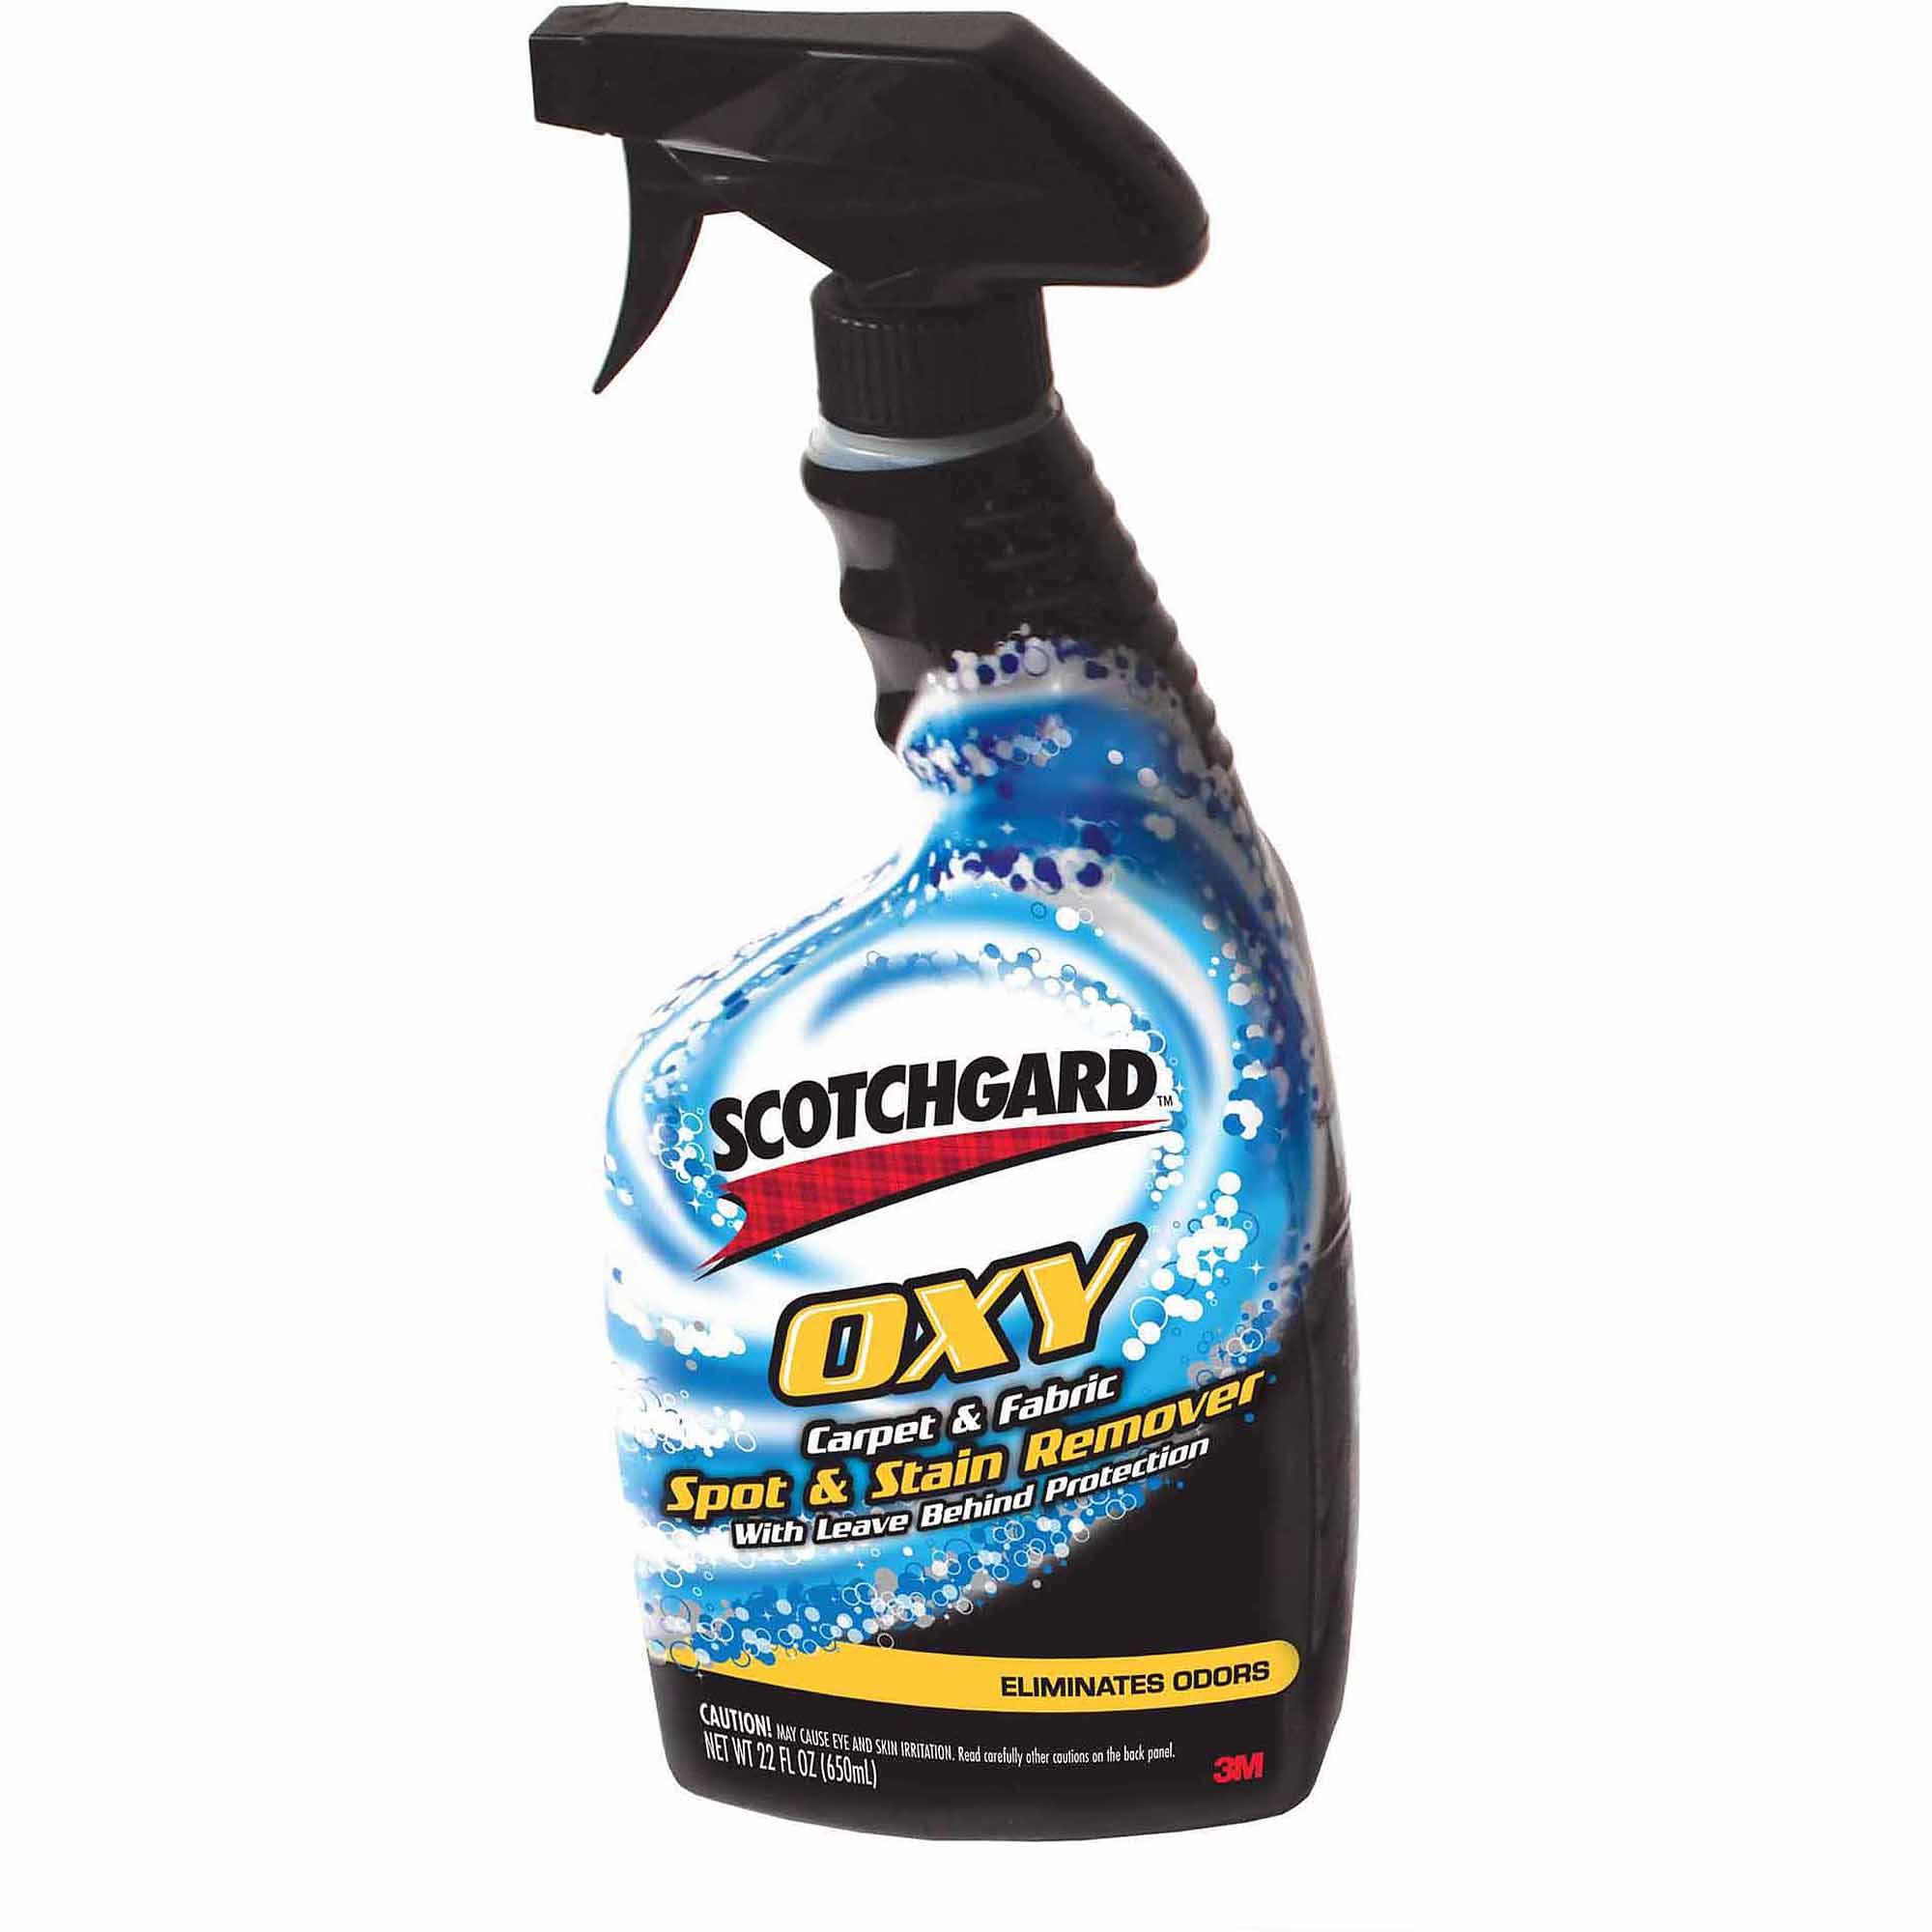 Scotchgard Oxy Auto Carpet & Fabric Spot and Stain Remover, 22 Oz.